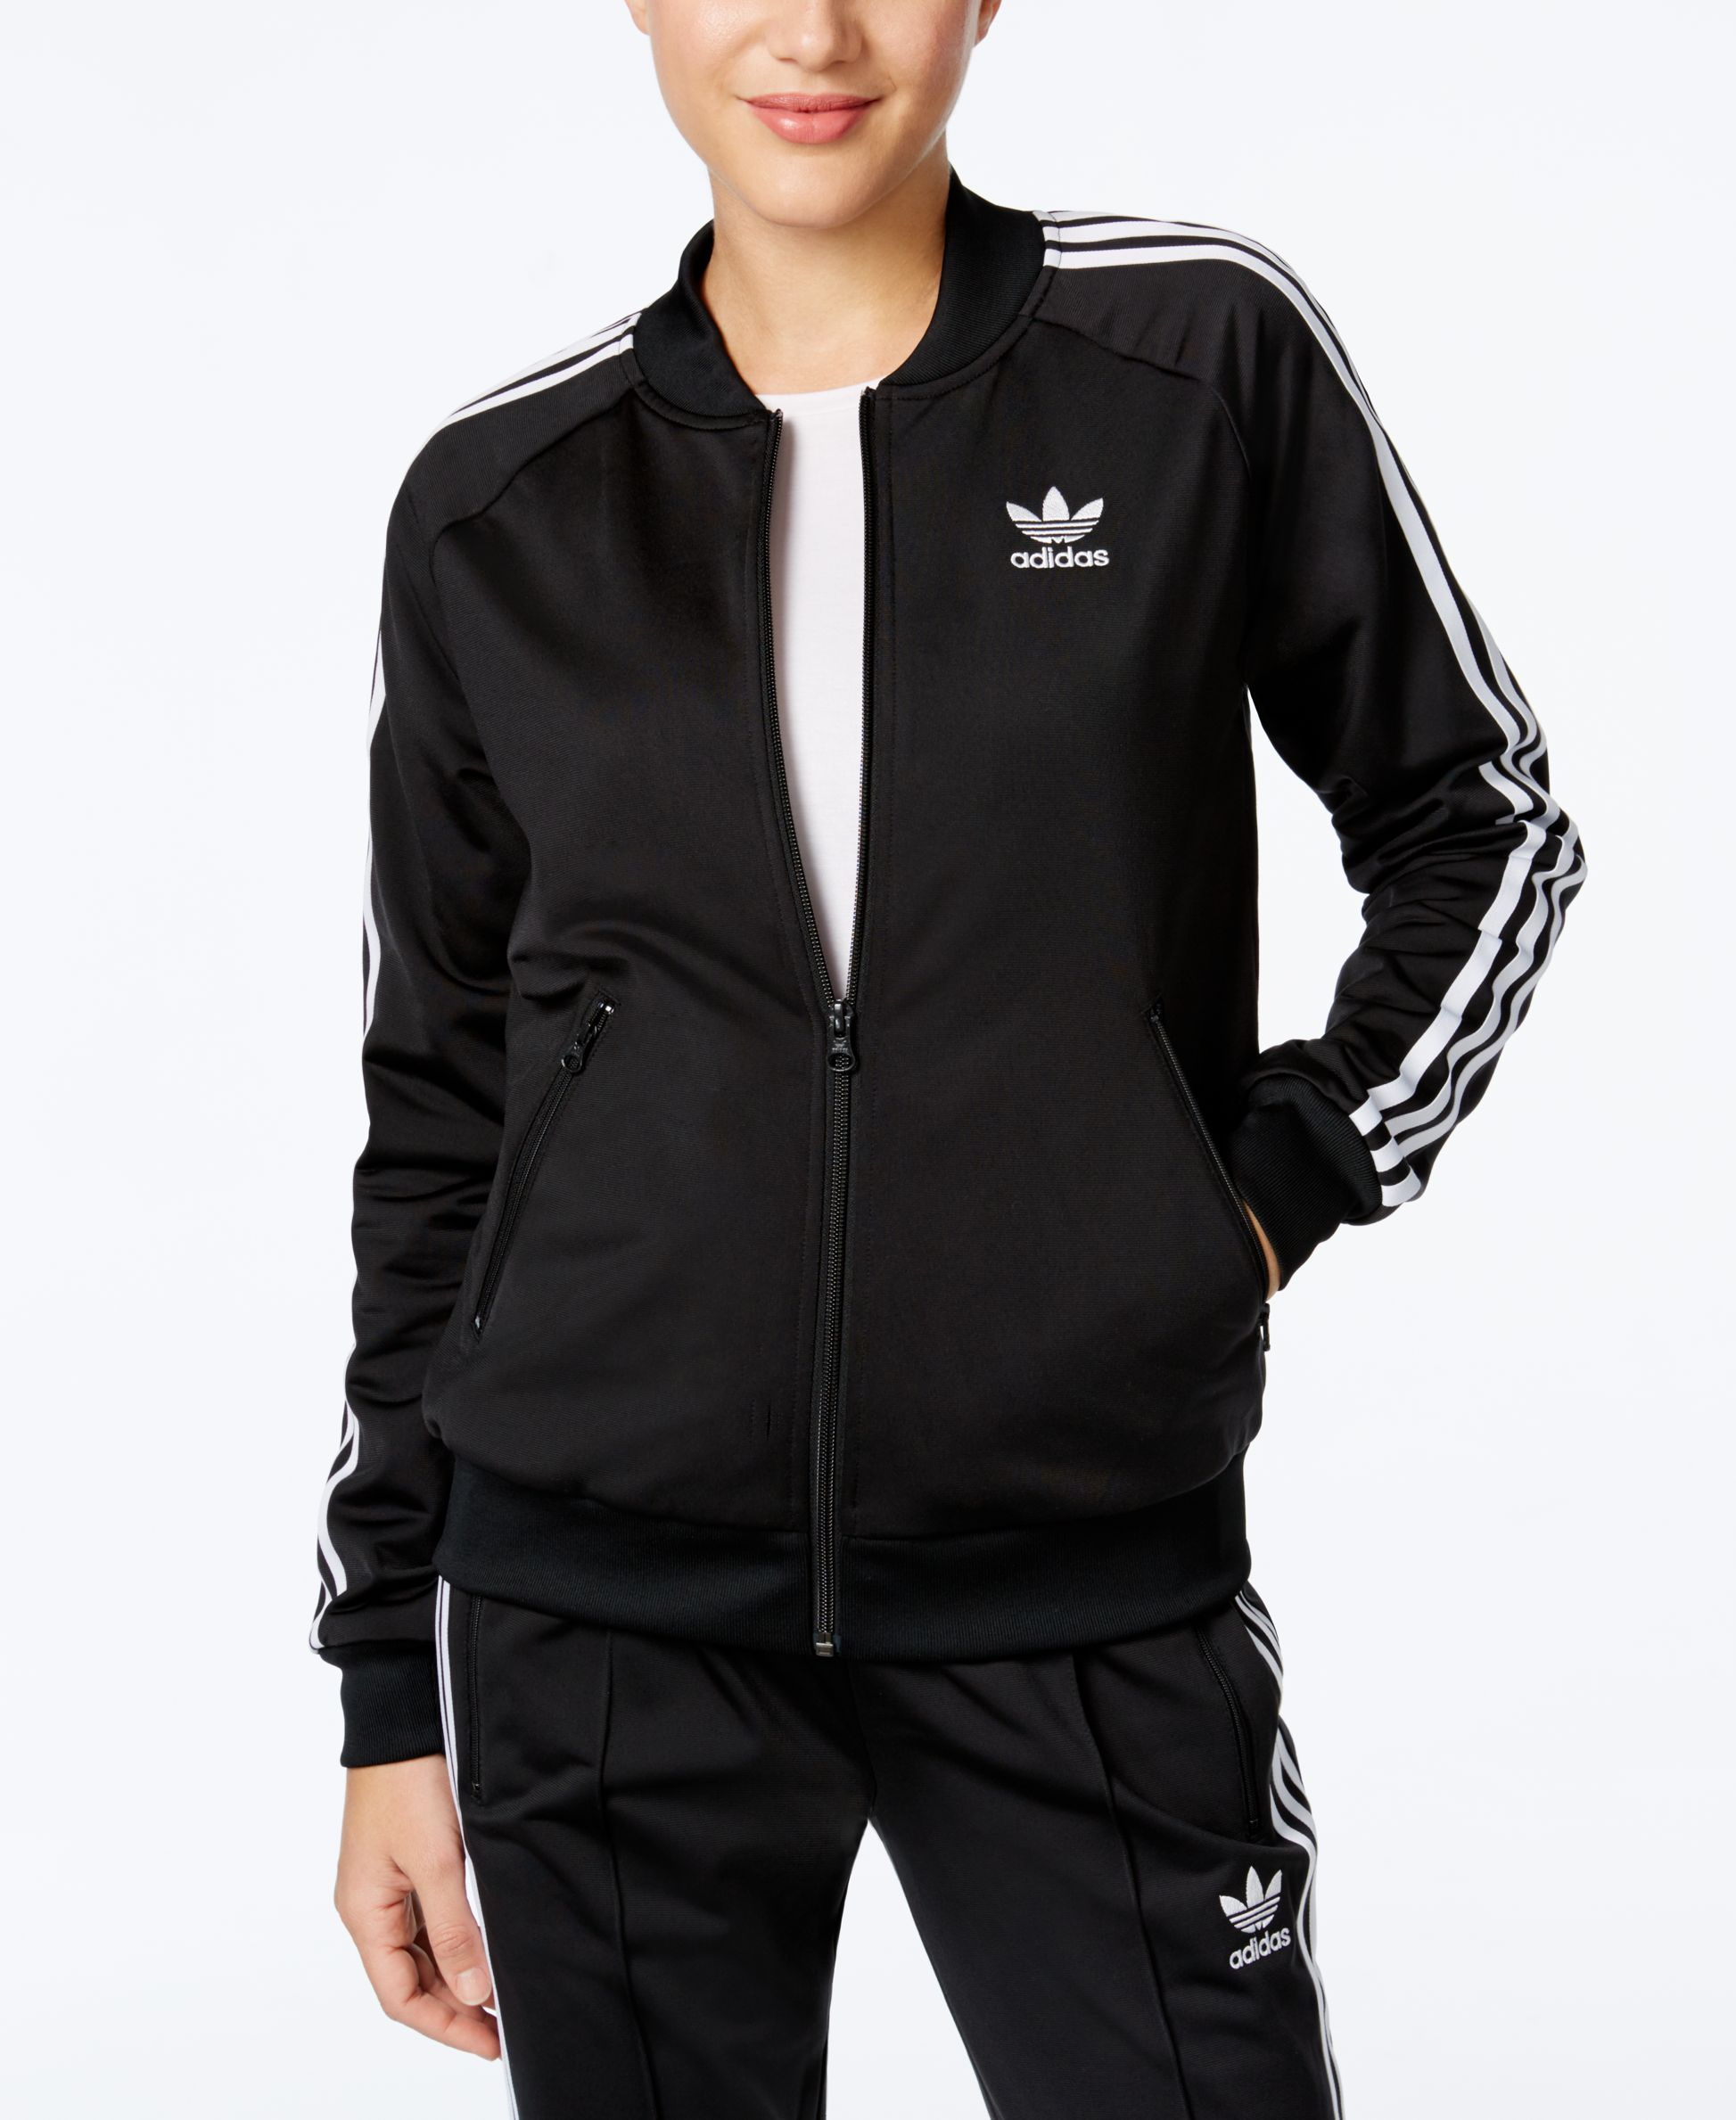 9e9d83e3852 adidas Originals Superstar Track Jacket | Products in 2019 | Adidas ...